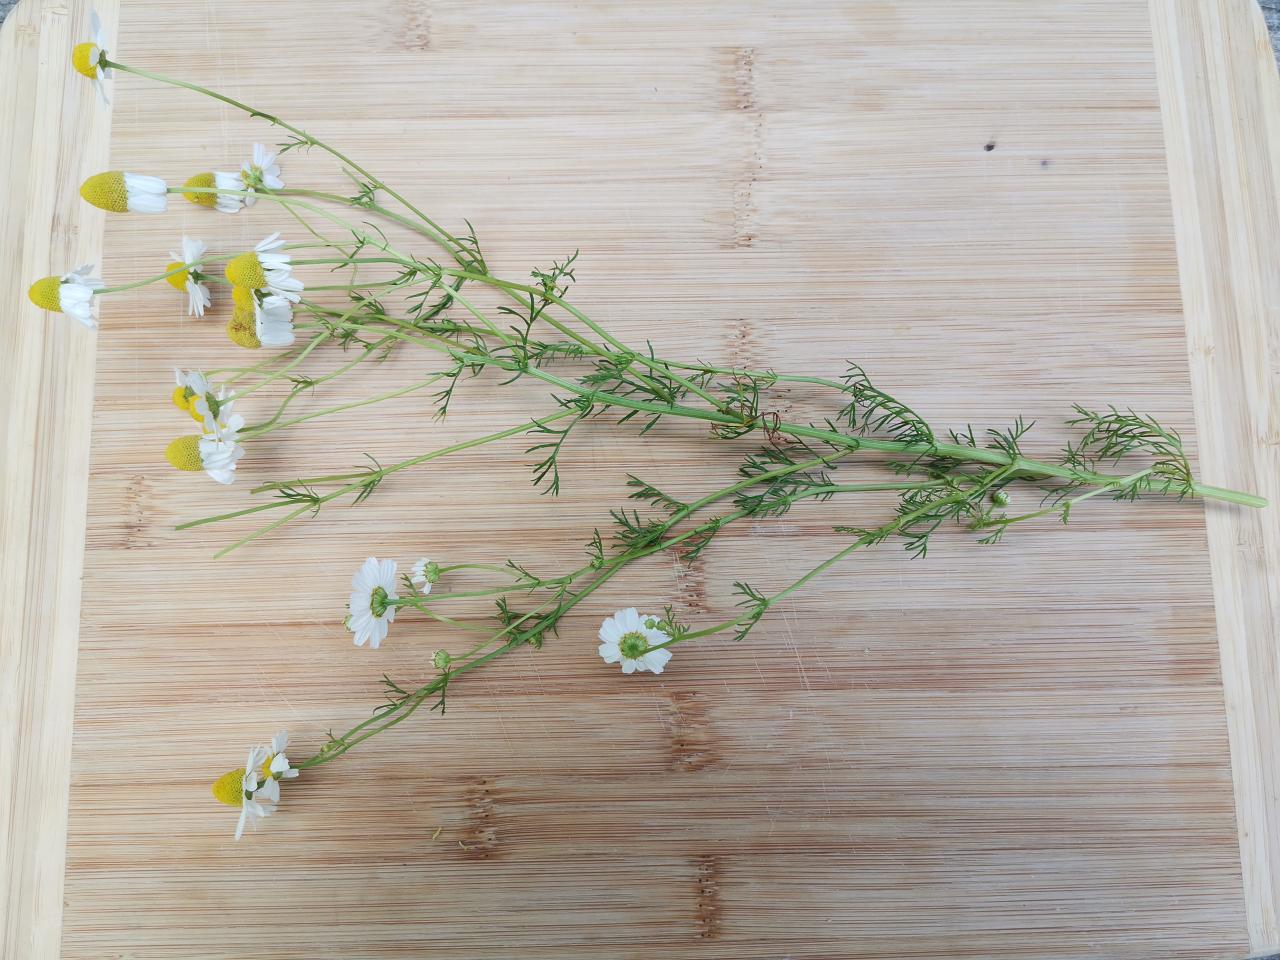 Echte Kamille - Ganze Pflanze